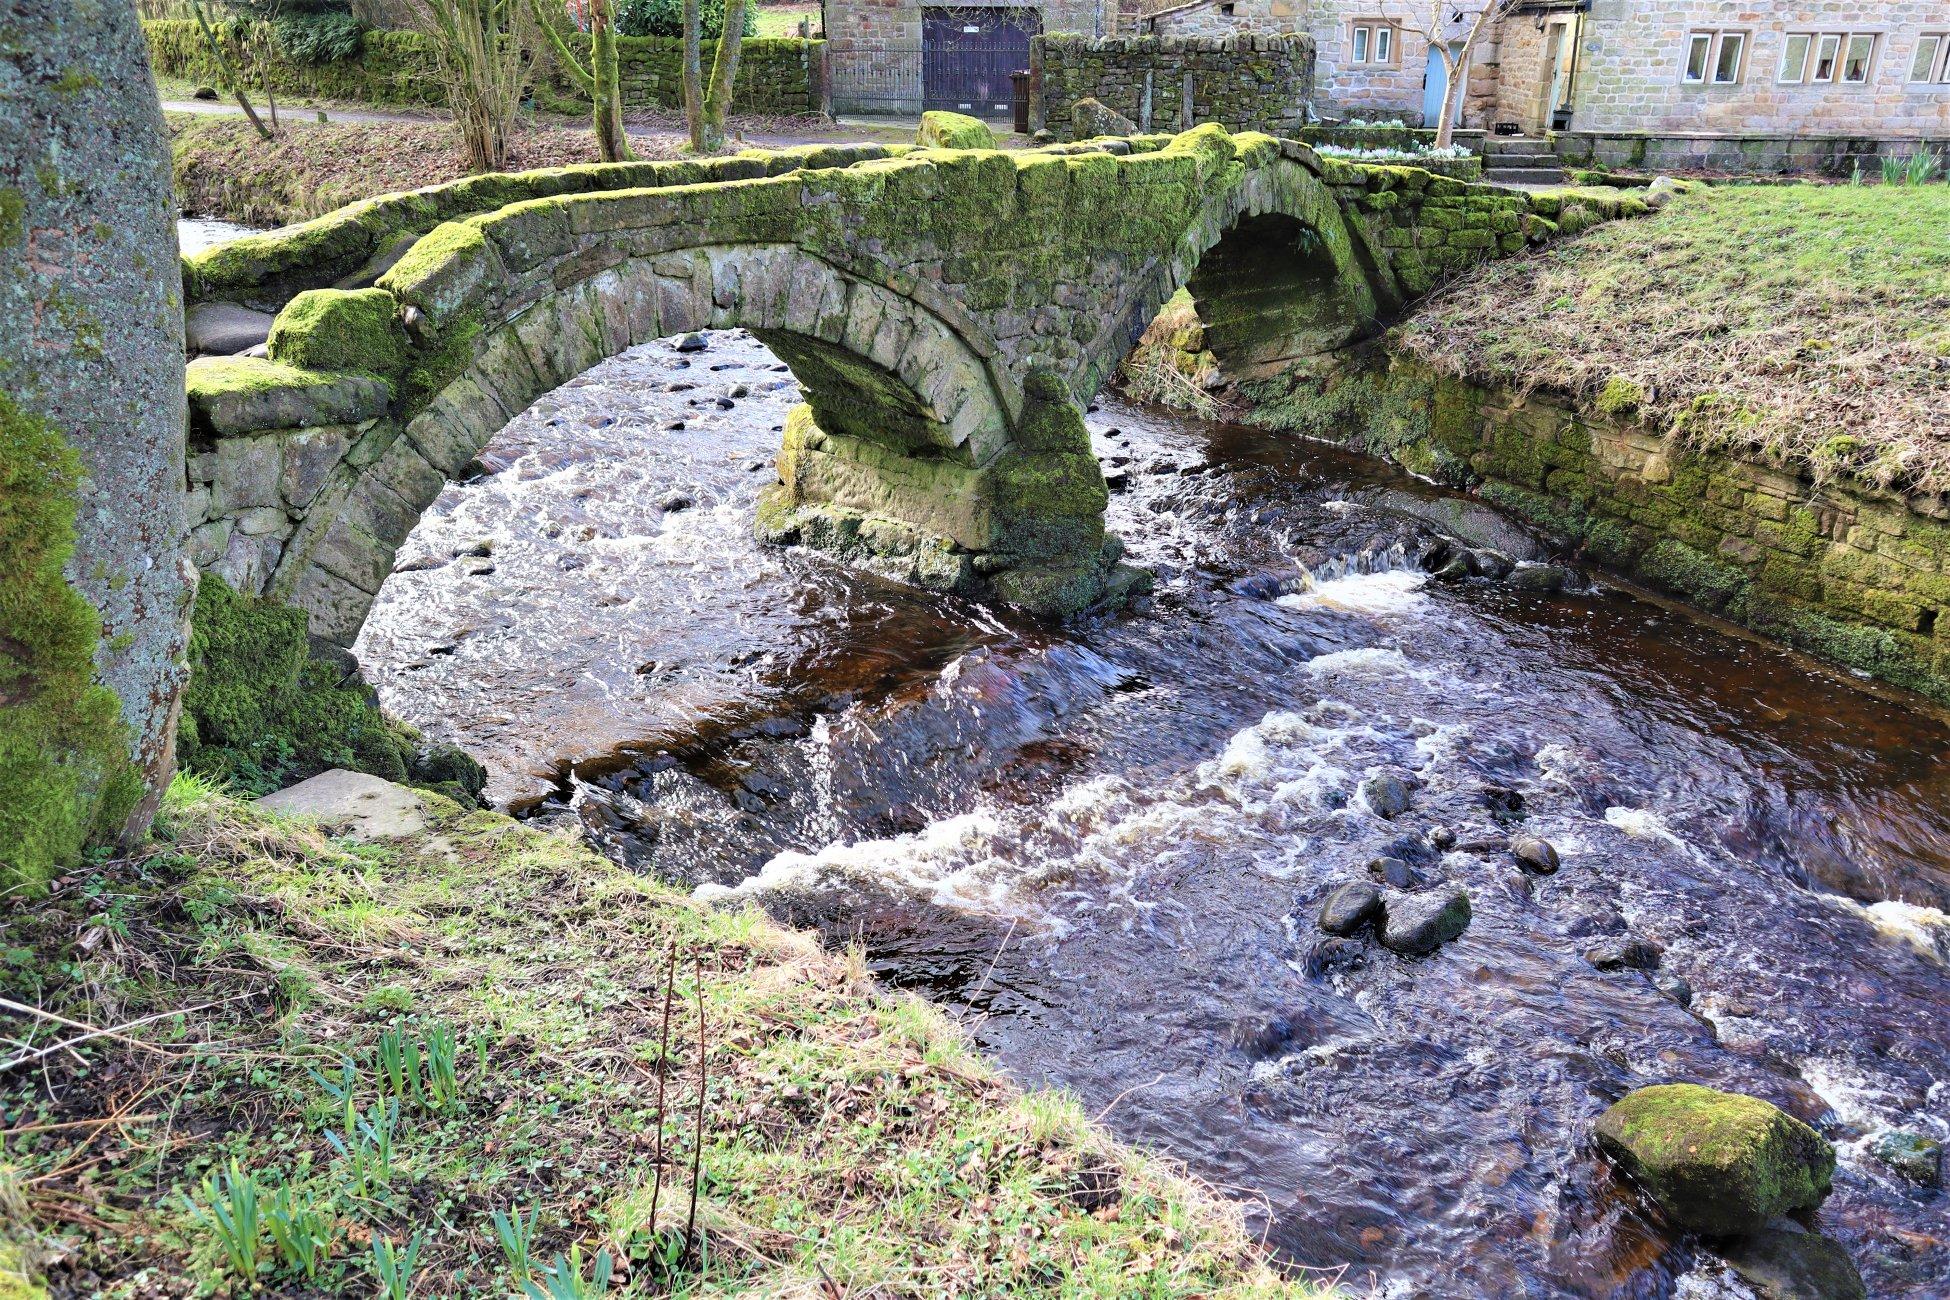 Packhorse Bridge (Wycoller)